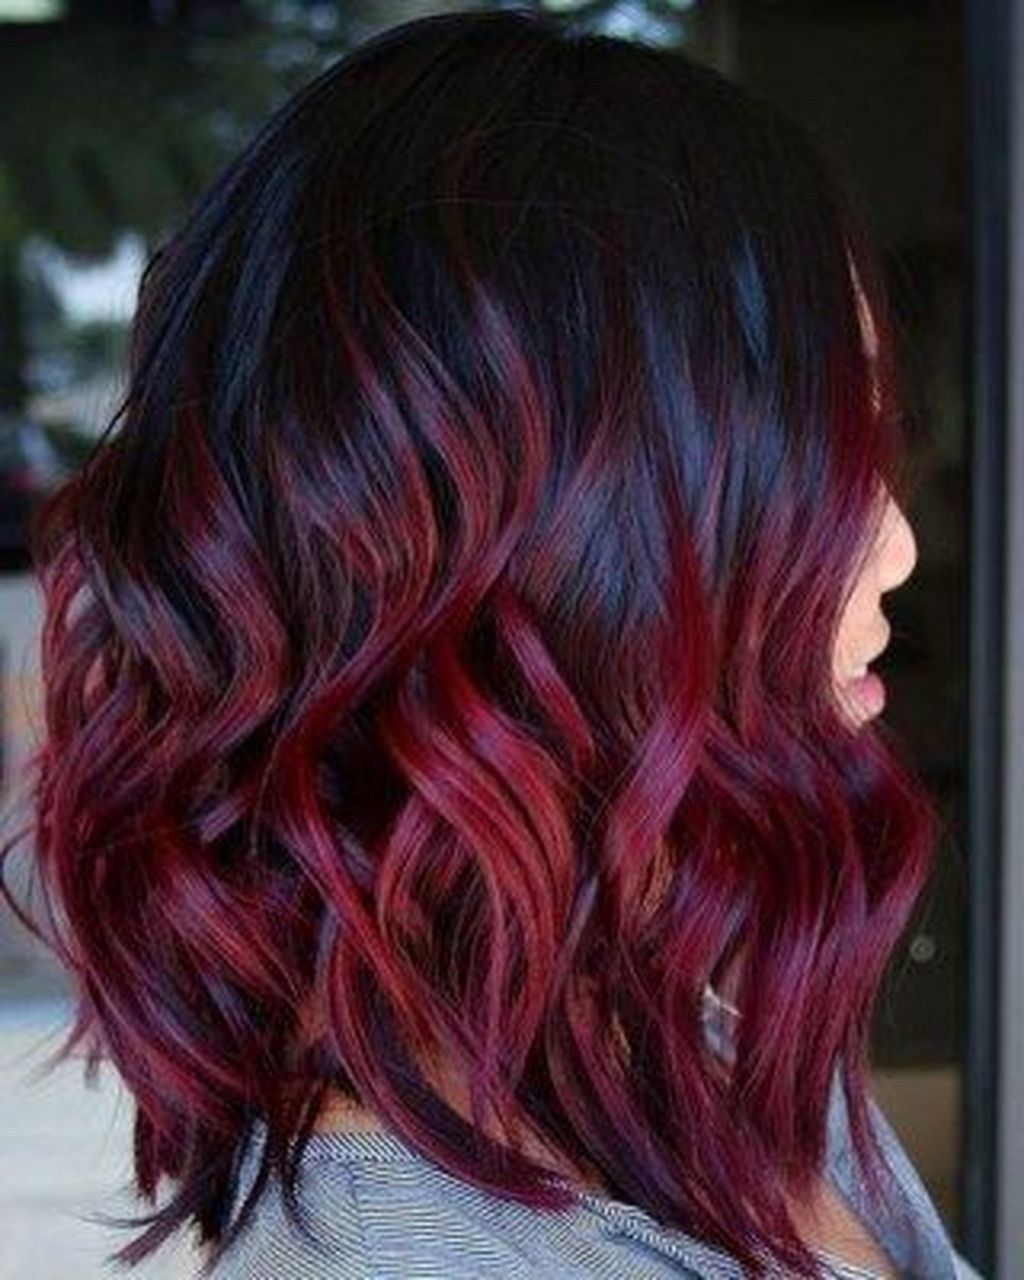 Best boy hair color  top and trending spring hair color ideas   hair  pinterest